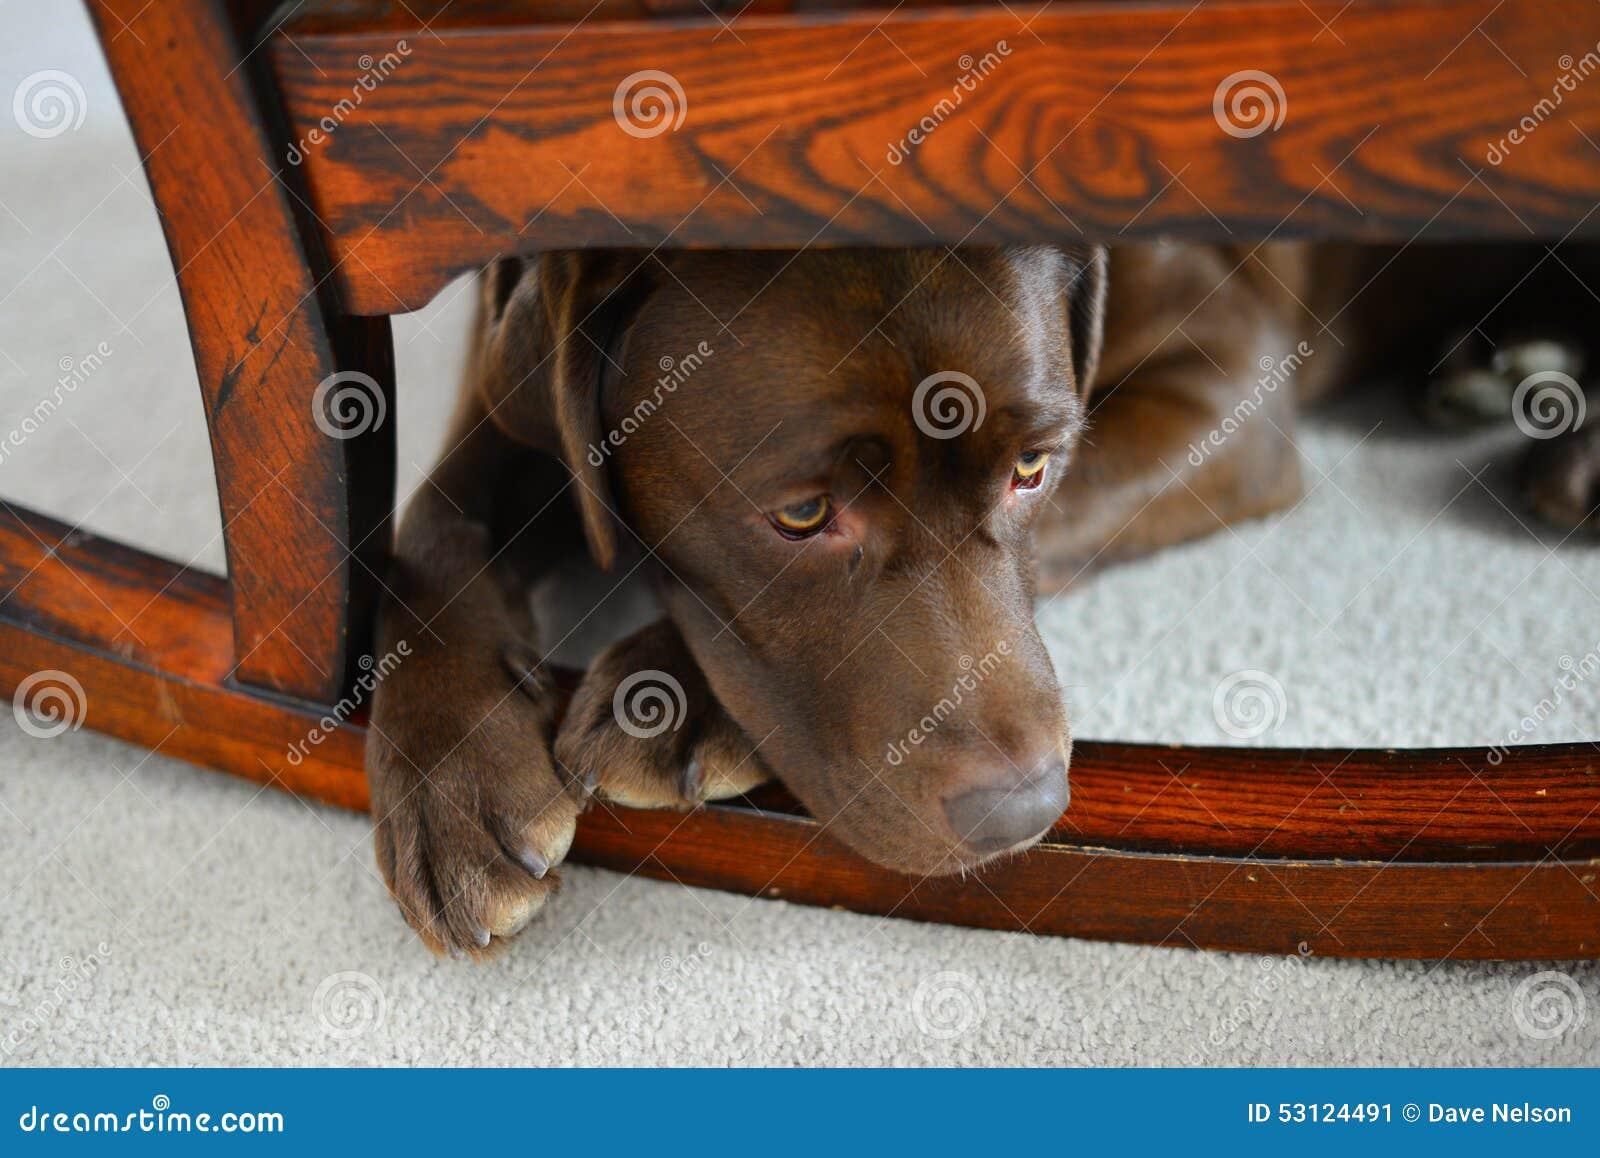 Chocolate Lab puppy lying under rocking chair